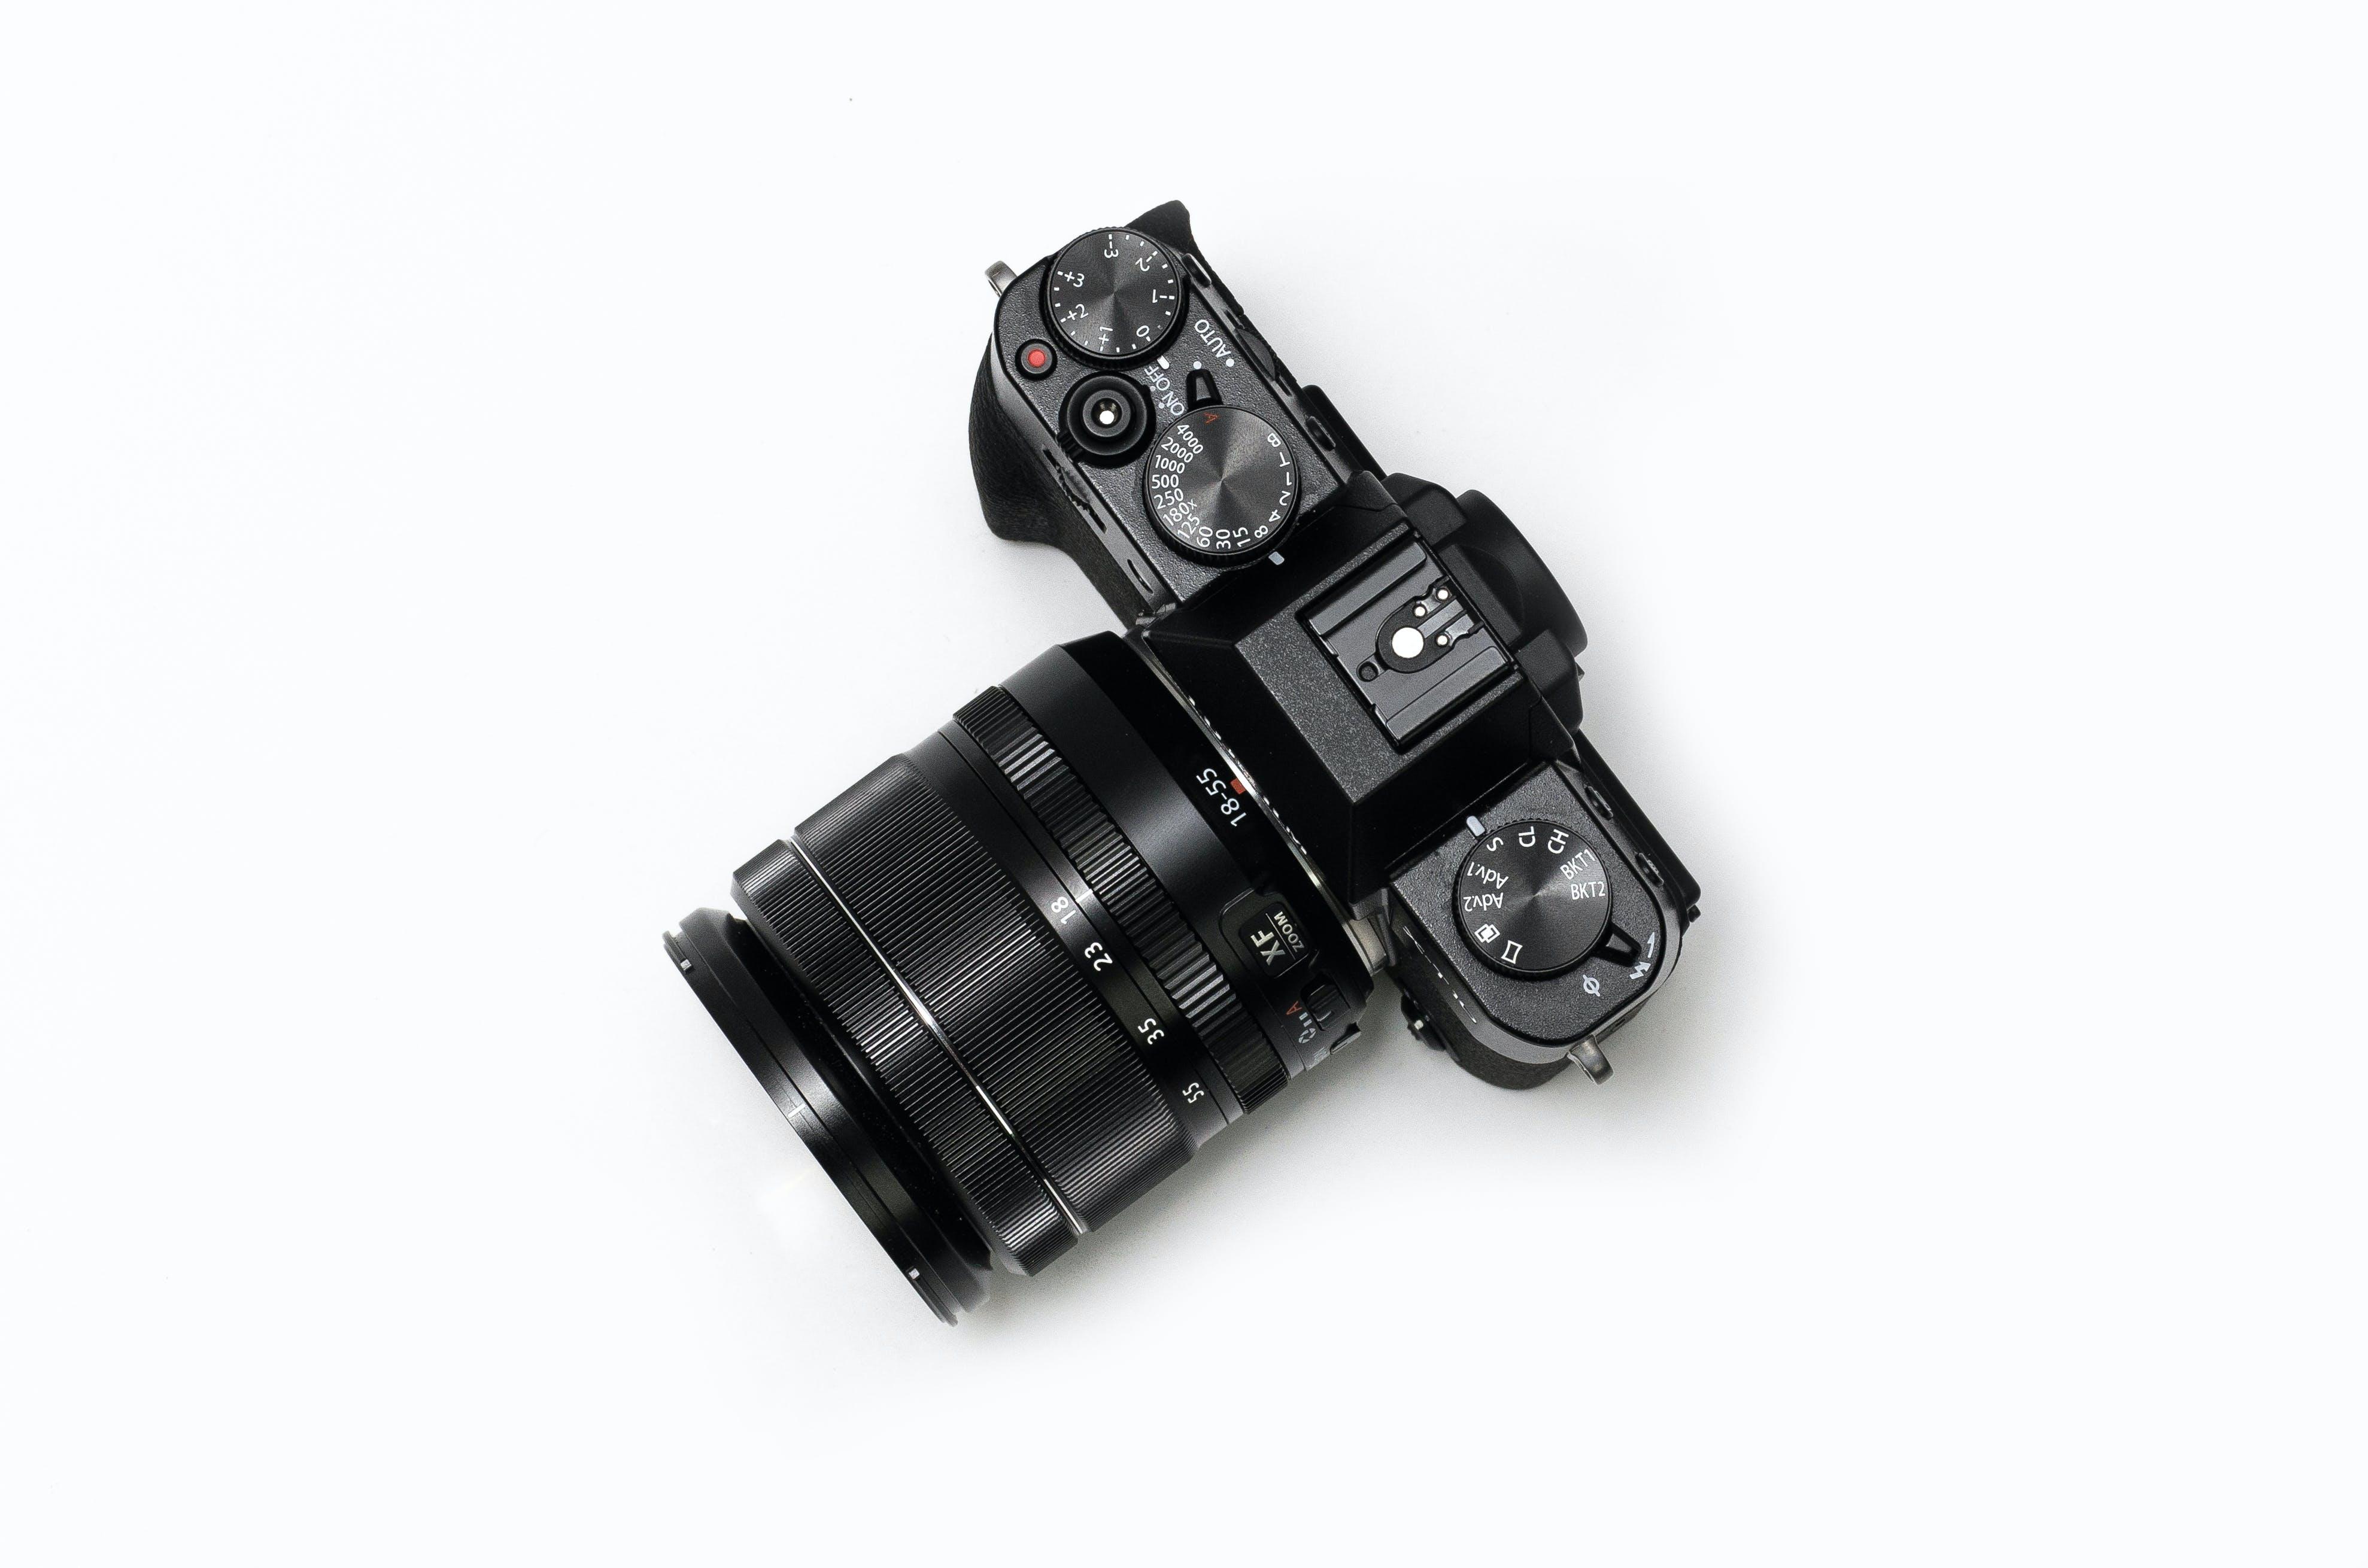 Free stock photo of camera, photography, lens, black